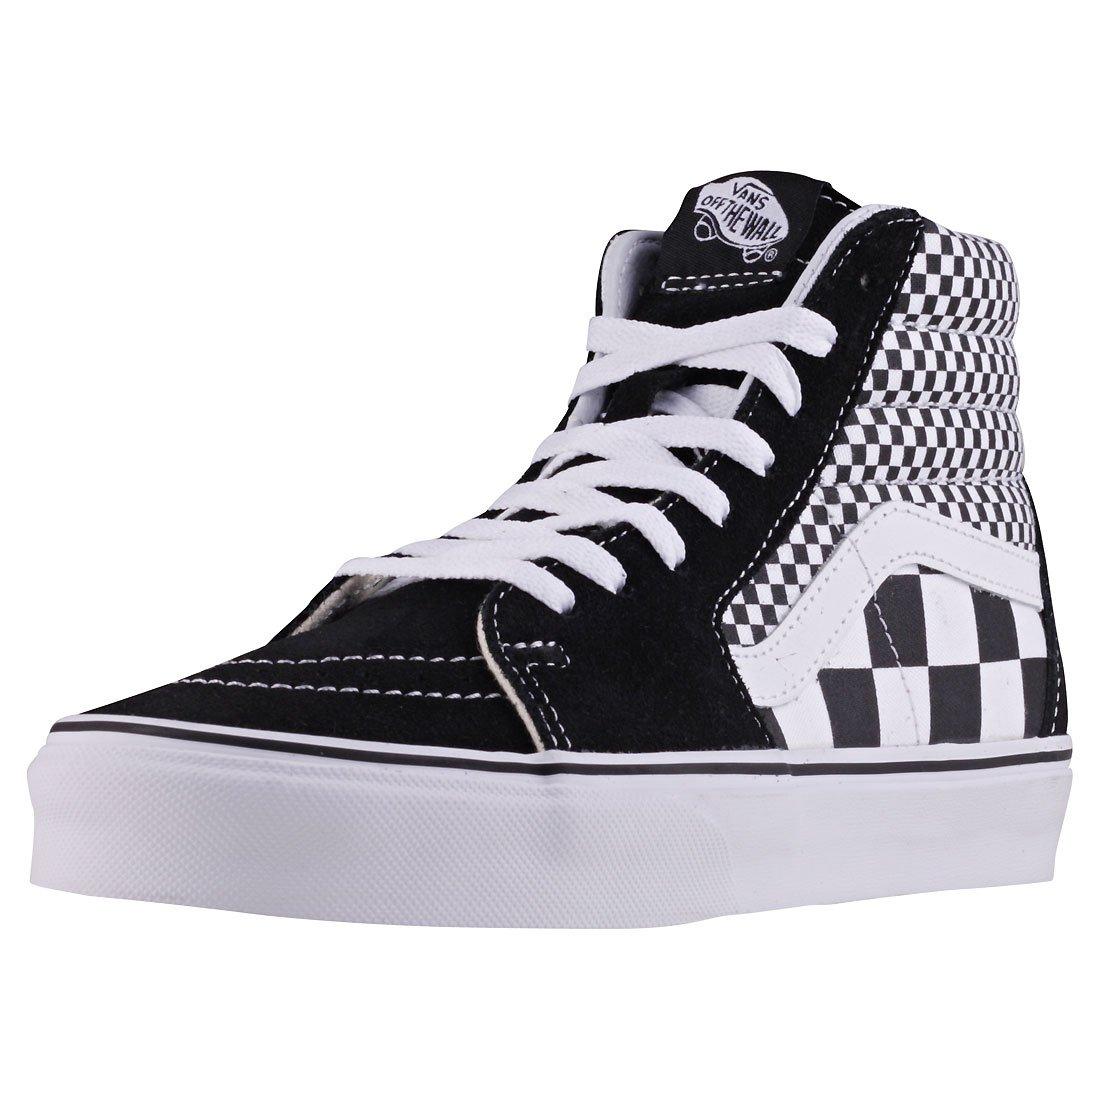 Vans Unisex SK8-Hi Mono Skate Shoes Mixed Checker/Black/True White 7 B(M) US Women/5.5 D(M) US Men